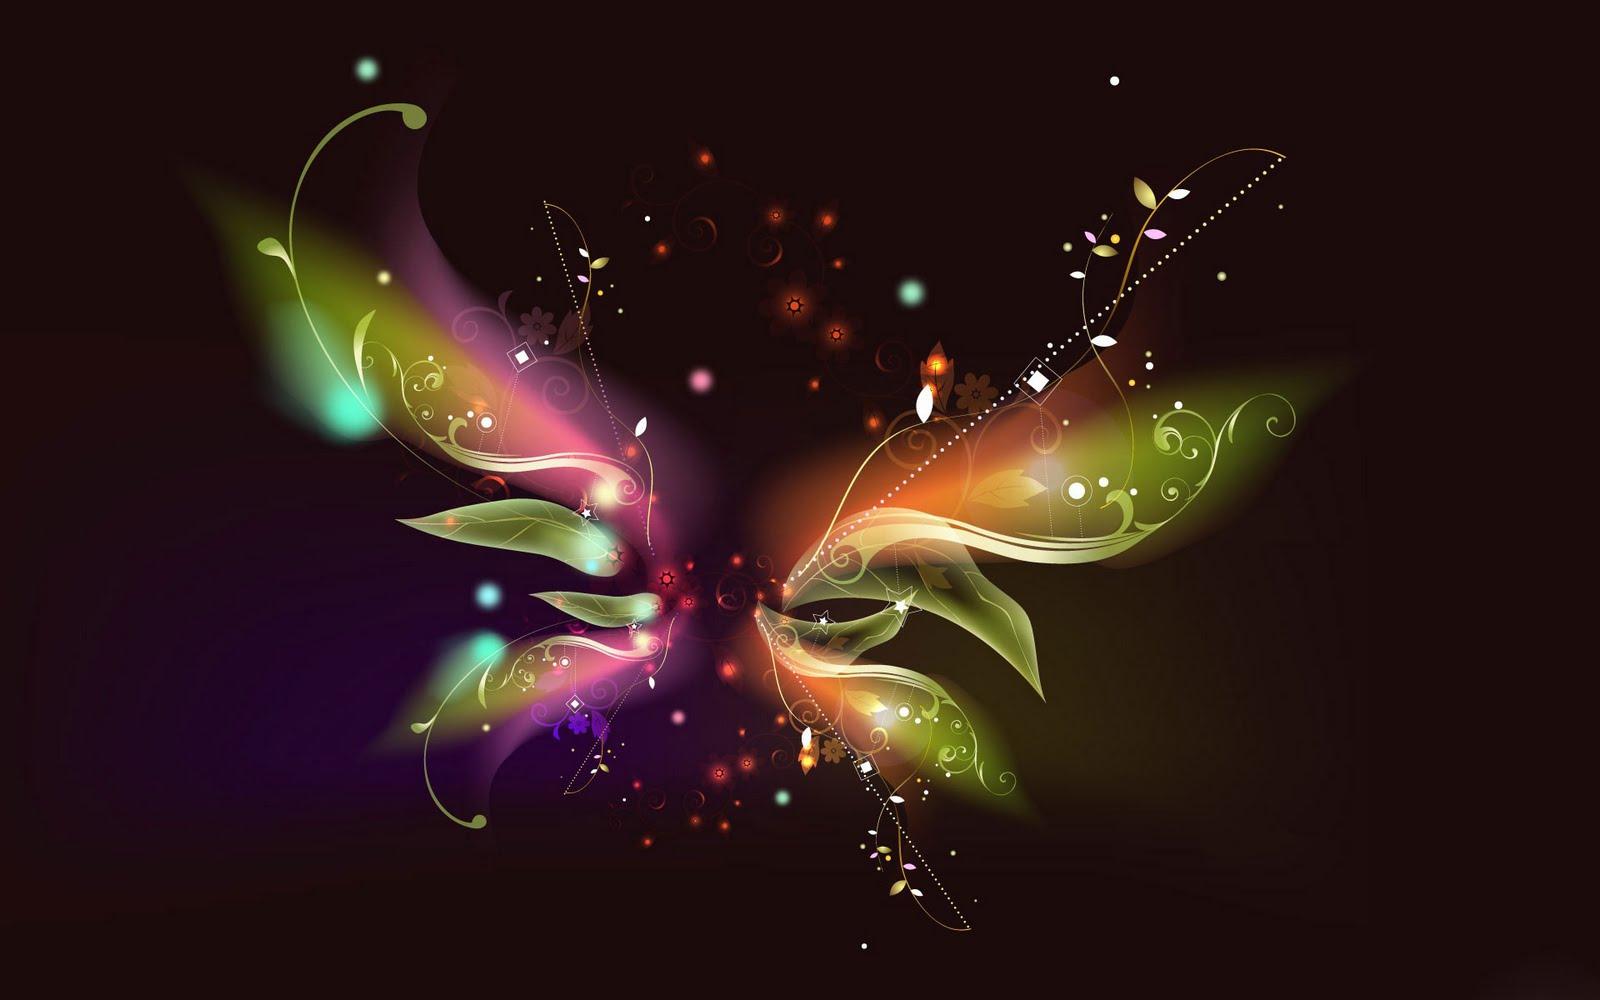 http://3.bp.blogspot.com/-GVXpF68I12I/TYFgl69o4II/AAAAAAAAALU/h_cxXh_TQw0/s1600/Elektric_Butterfly_desktop_background.jpg